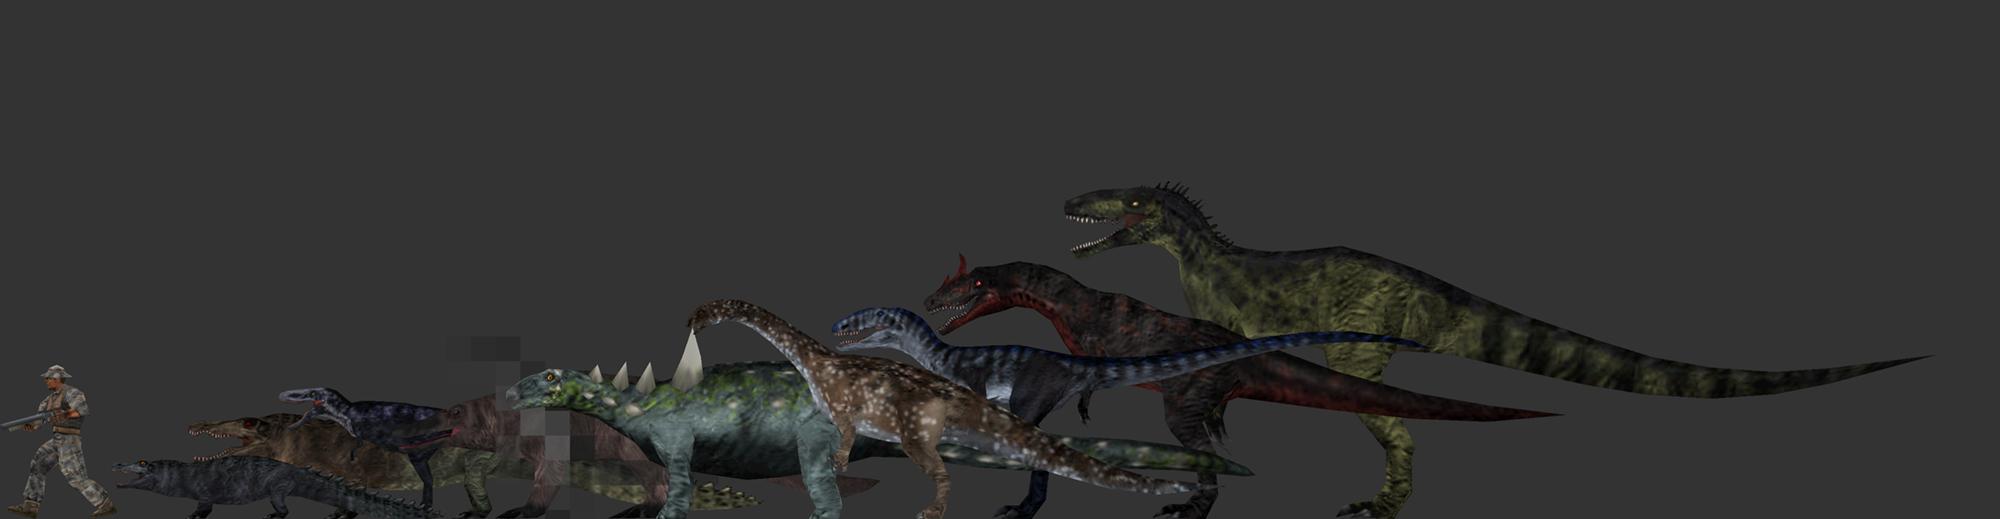 All animal models for Antipodes so far.